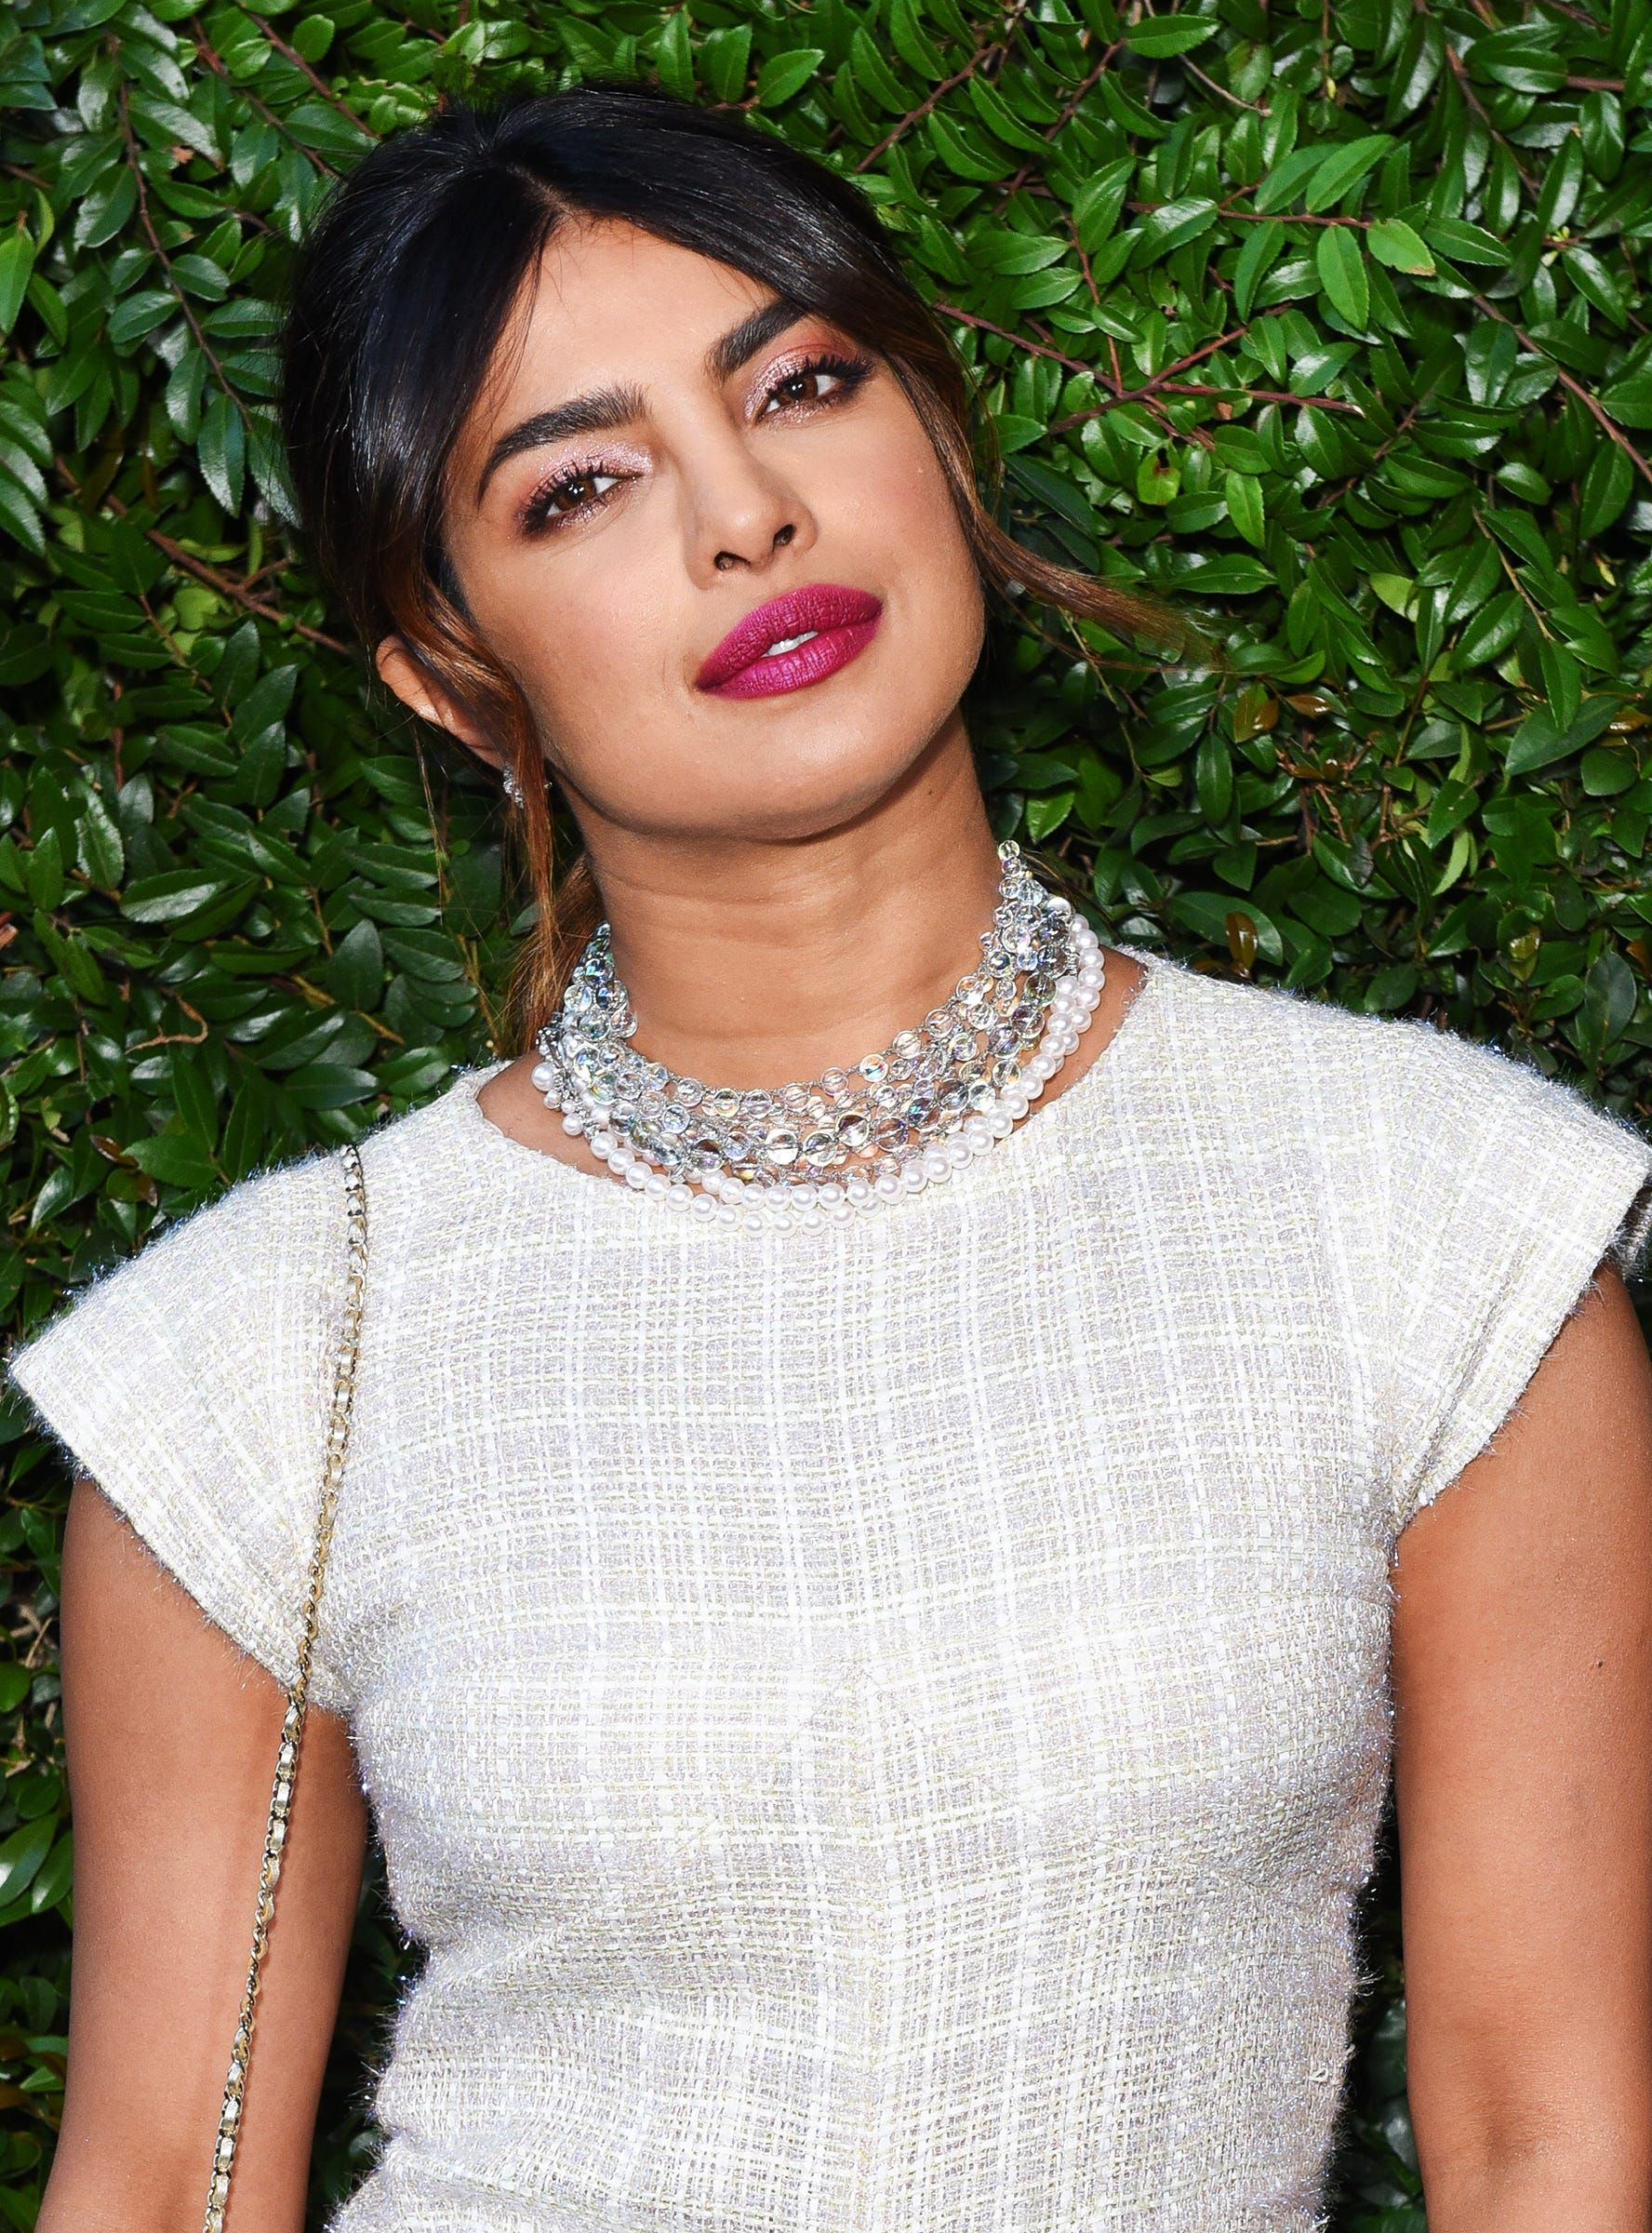 Photo of The $30 Lipstick Priyanka Chopra Wore For Her Wedding